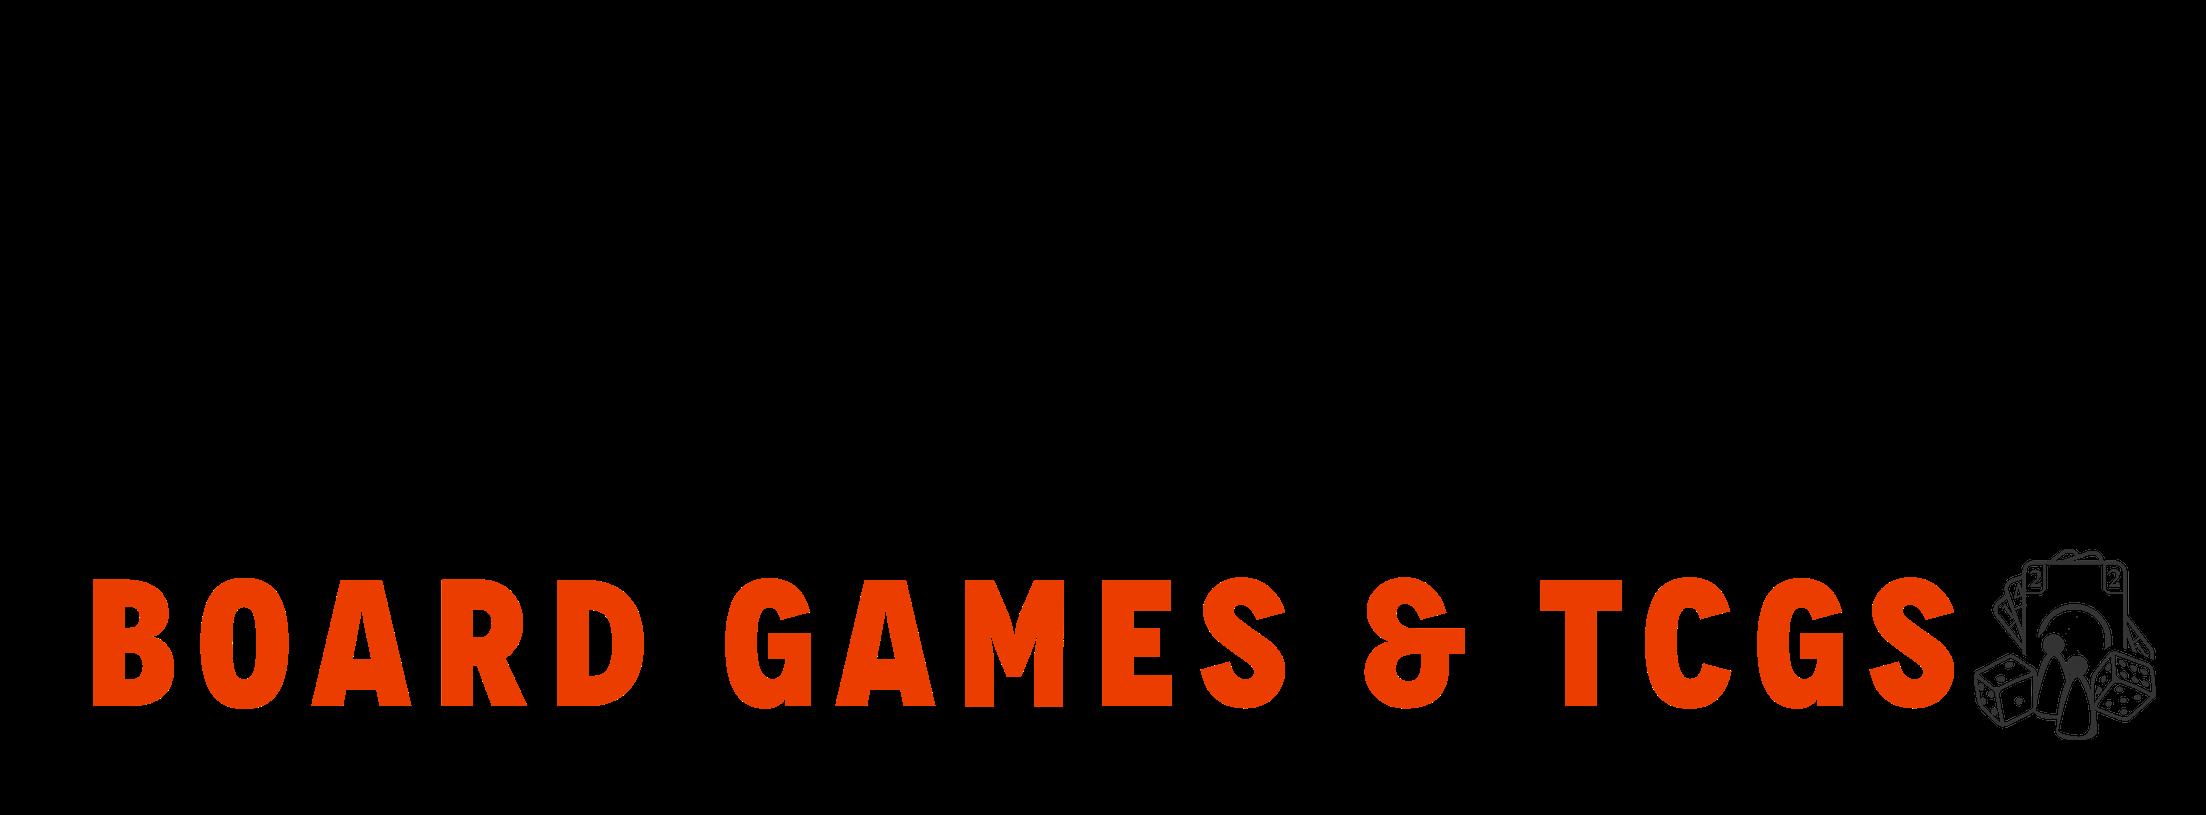 La Tribu Boardgames & TCG